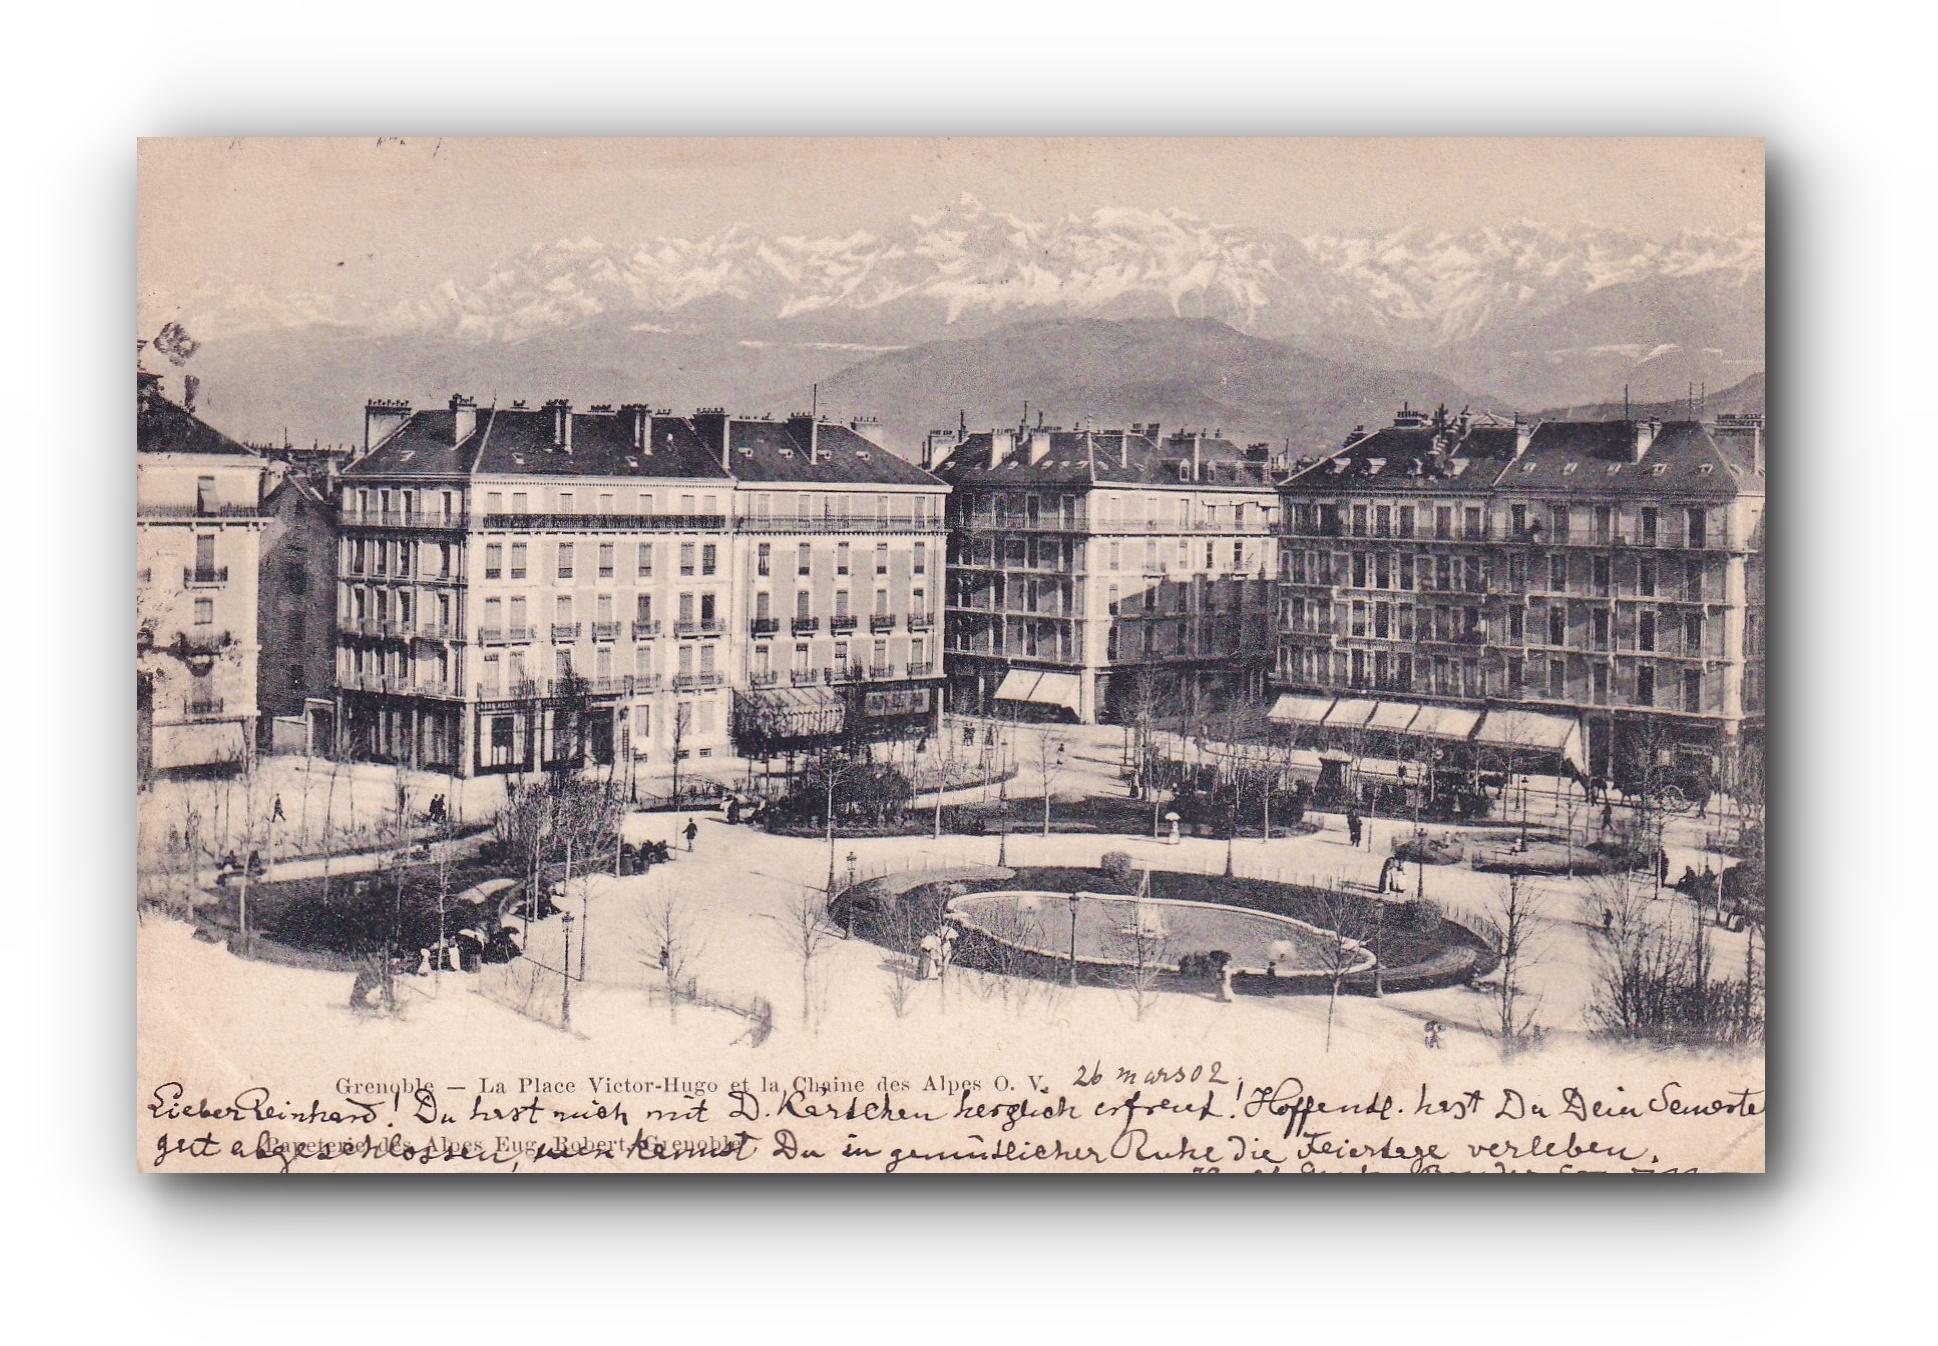 GRENOBLE  - 28.03.1902 - Place Victor Hugo et les Alpes - Der Platz Victor Hugo und die Alpen - Place Victor Hugo and the Alps